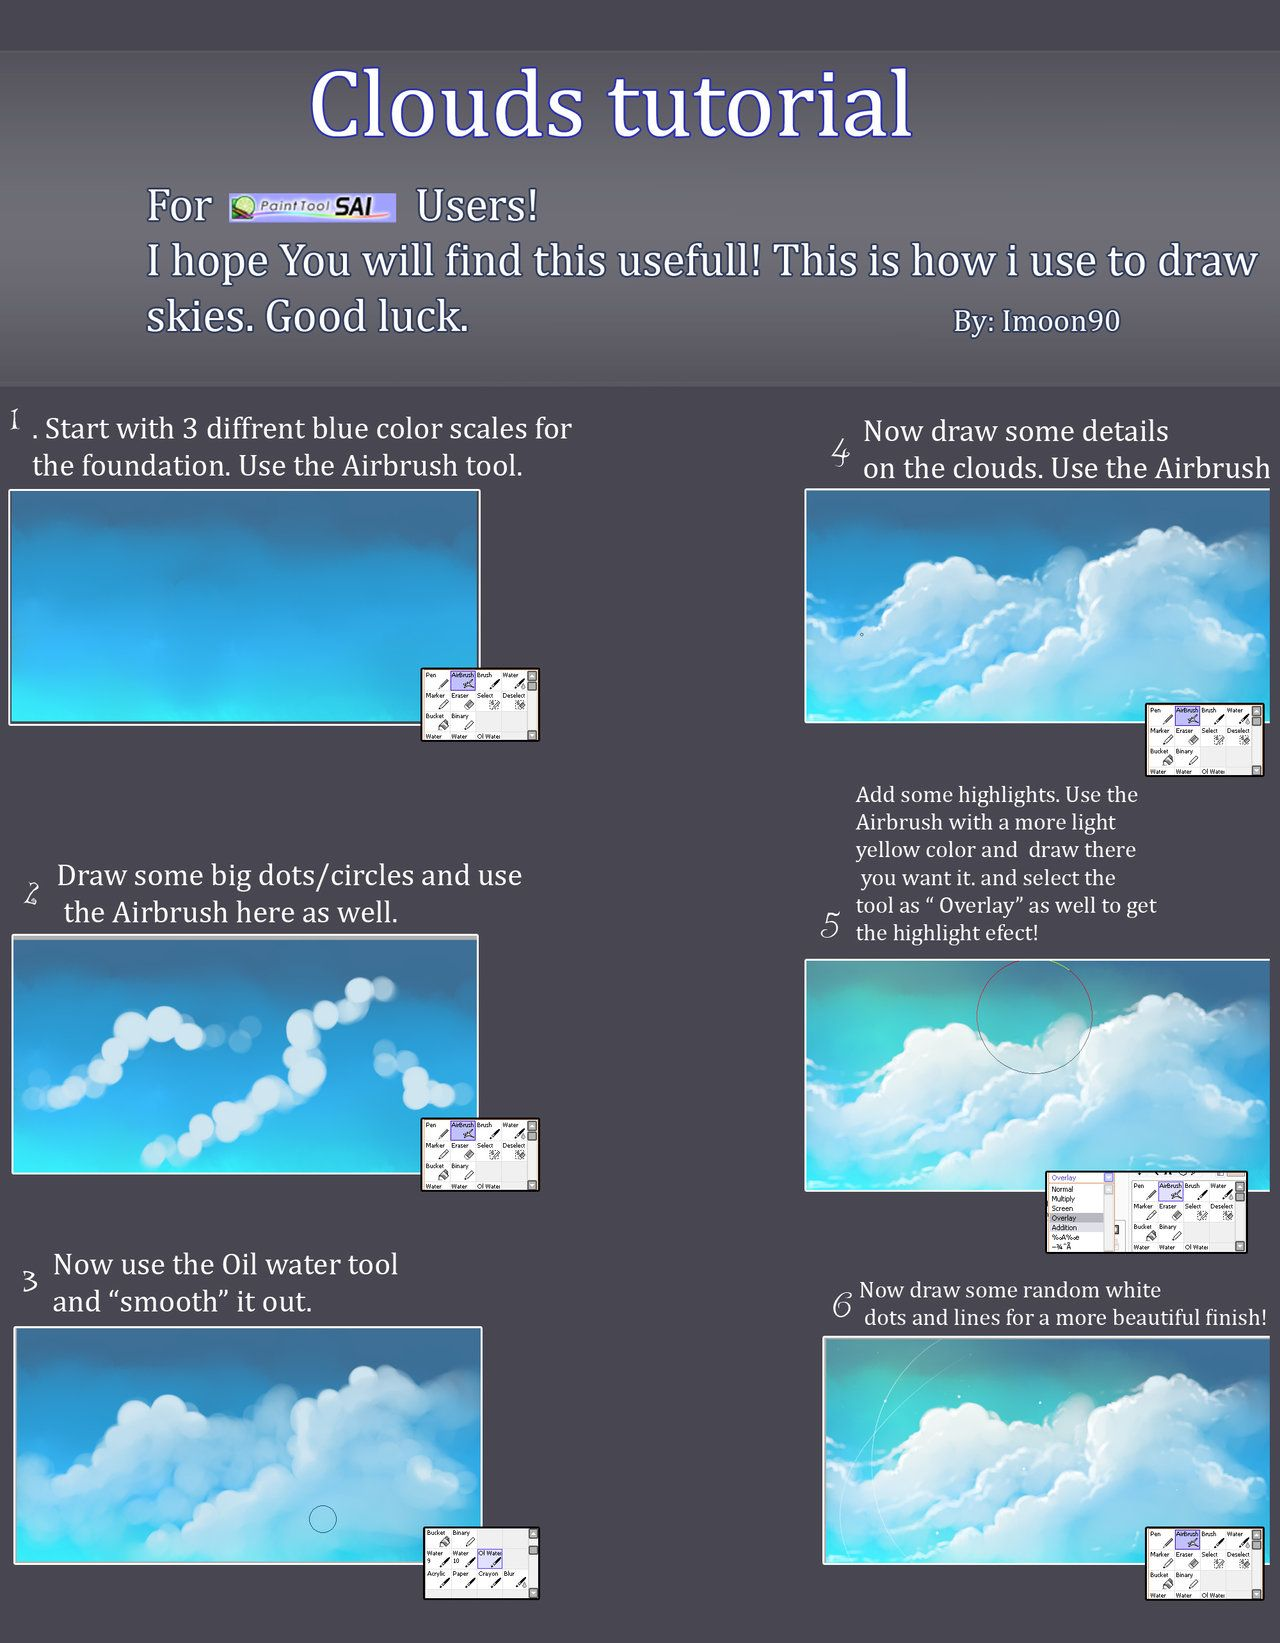 Clouds tutorial by Imoon90 | Digital Art | Pinterest | Cloud ...